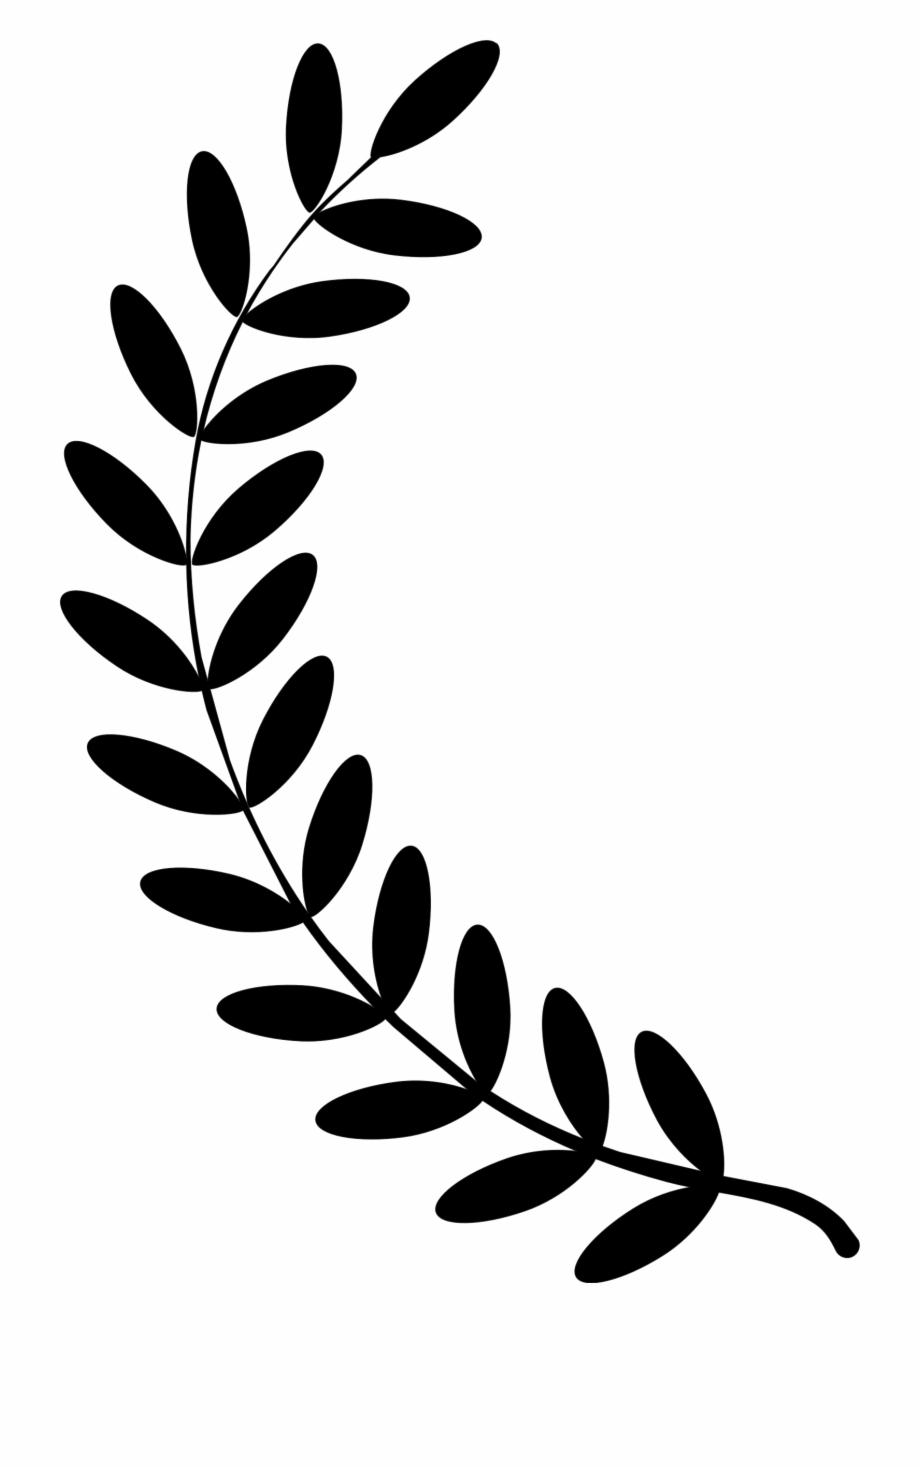 Clip Art Royalty Free Onlinelabels Clip Art Wreath